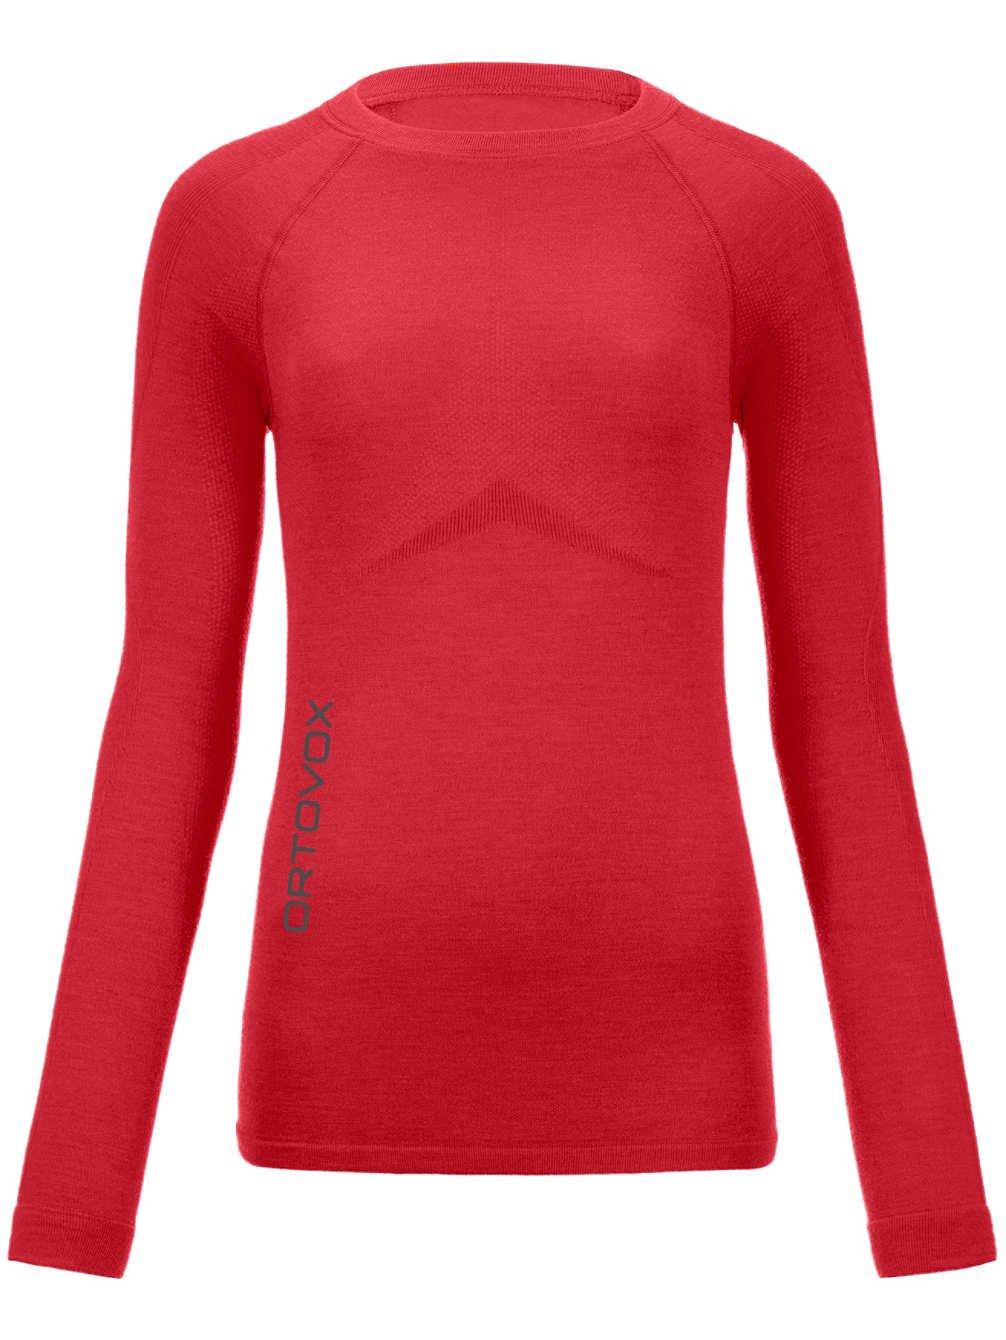 Ortovox 230 Competition Long Sleeve W, Damen Unterwäsche